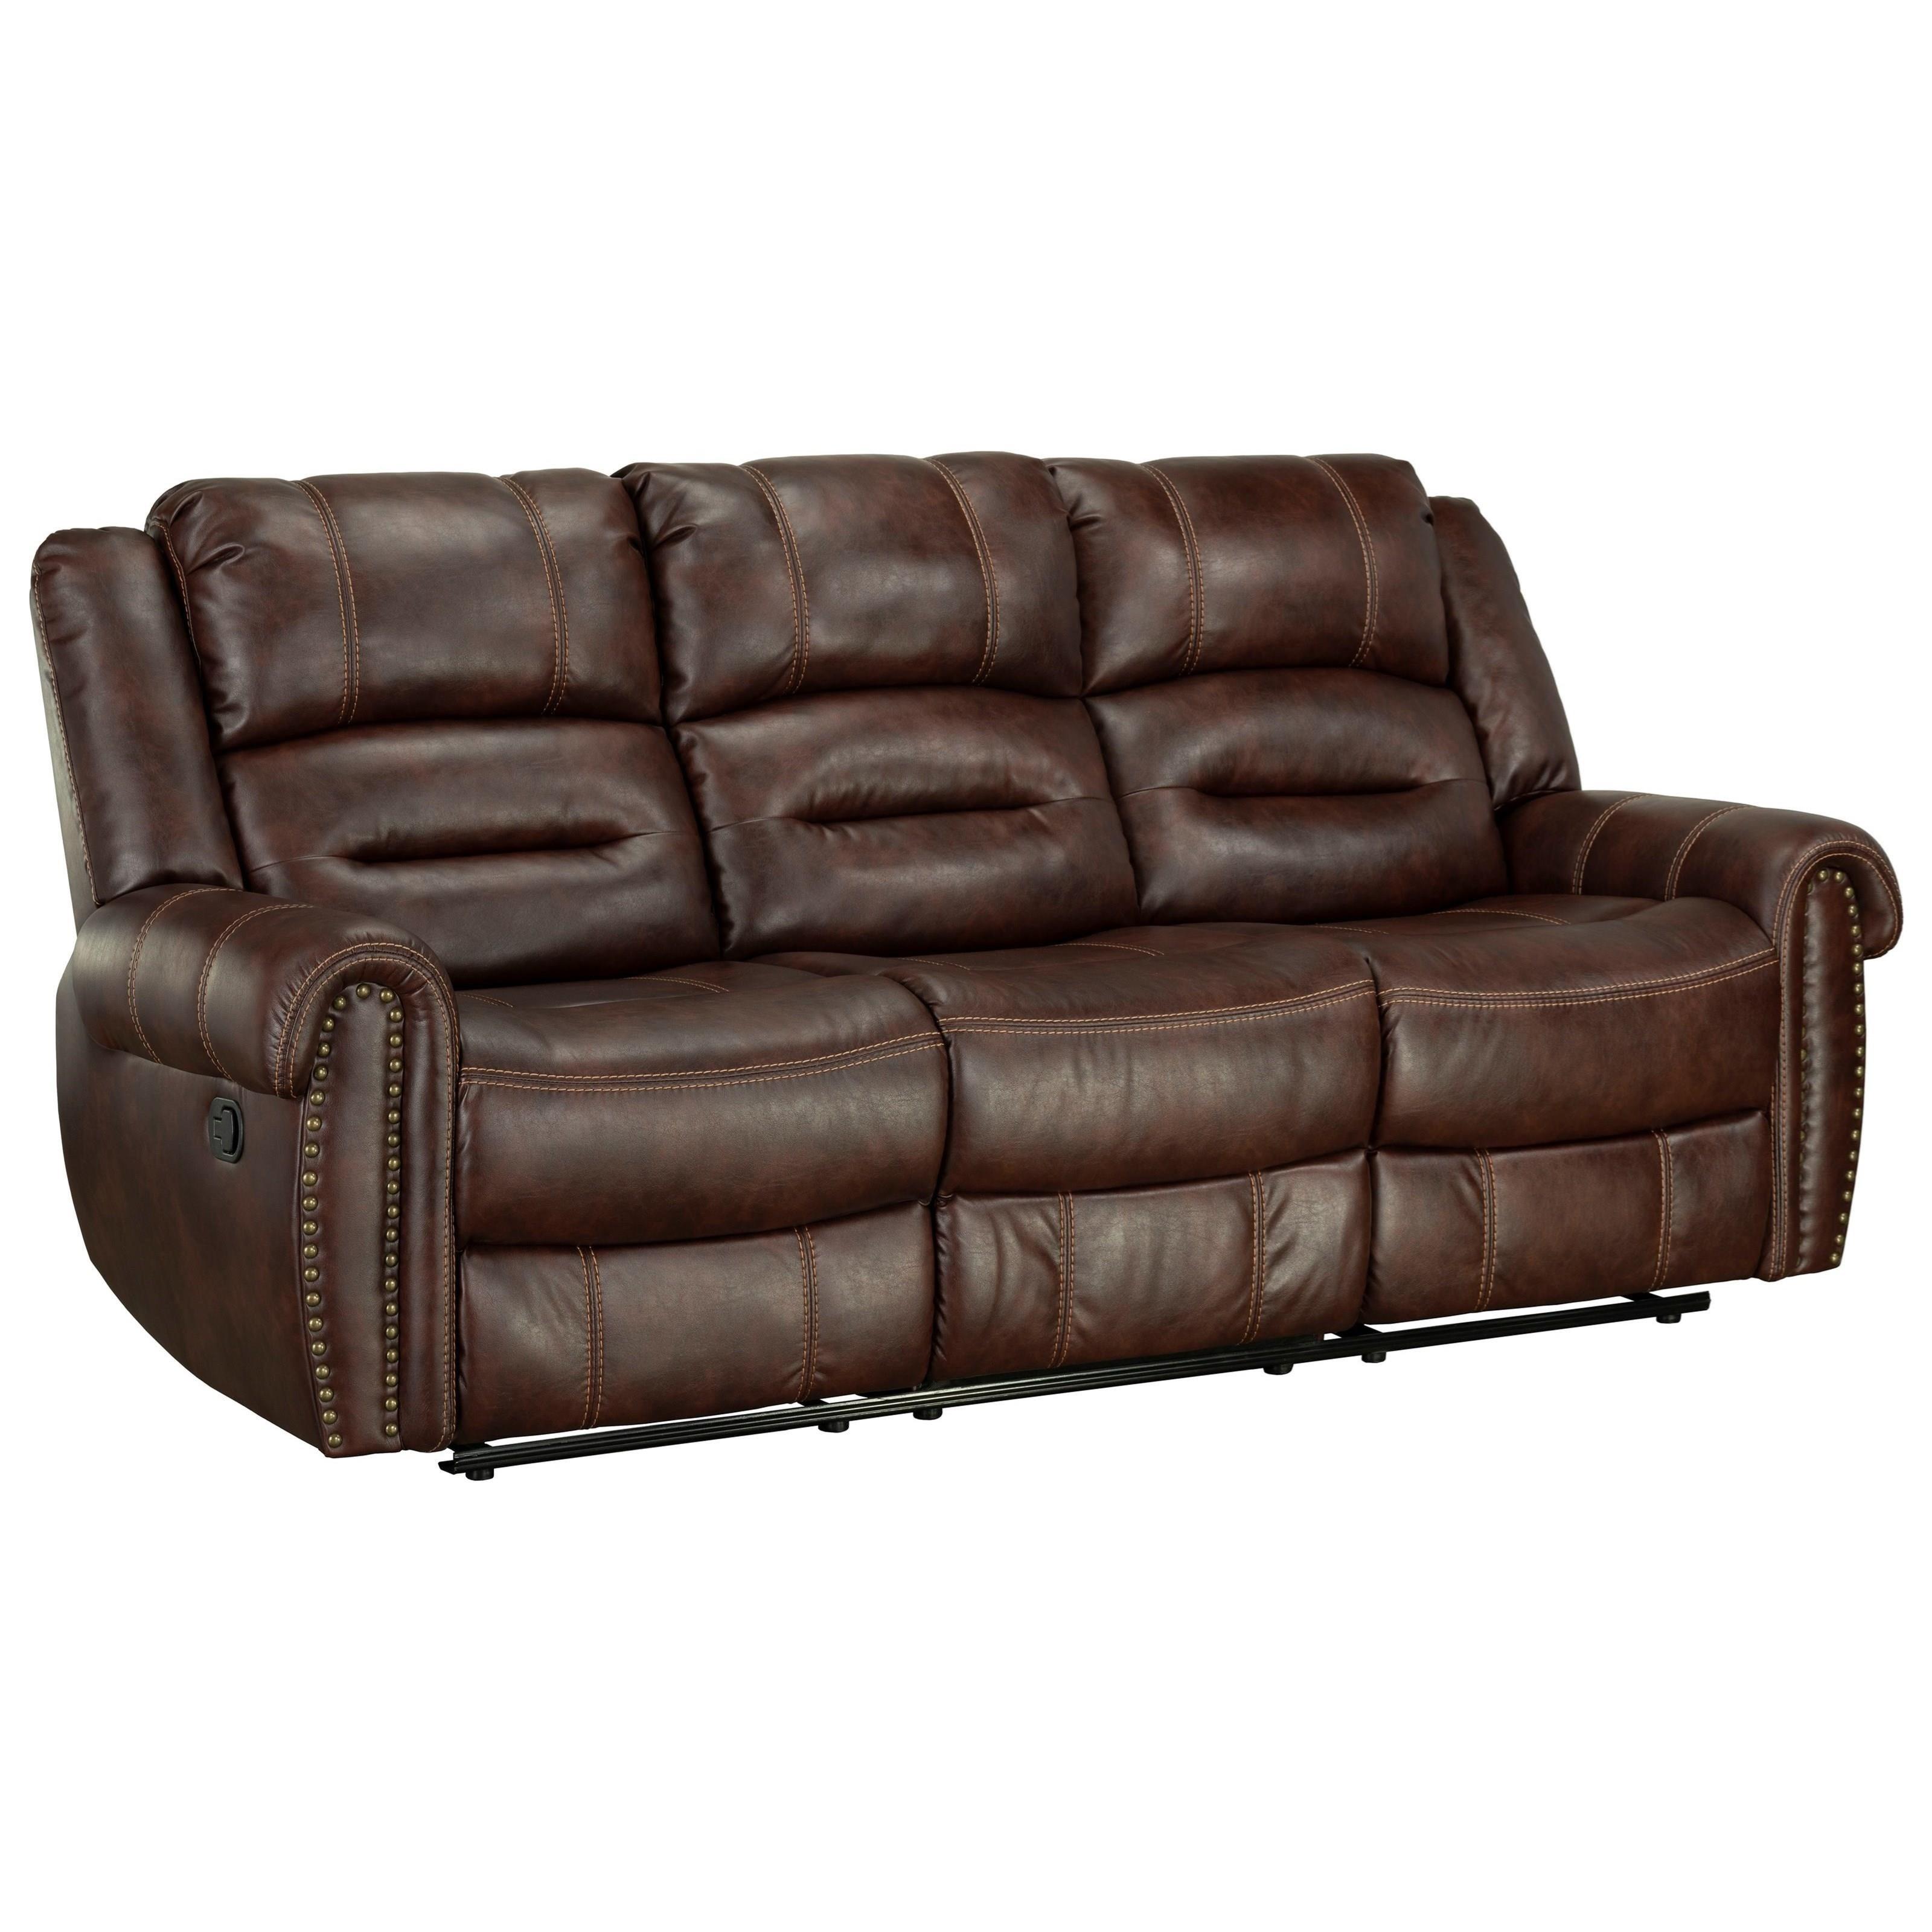 reclining sofa with nailhead trim futon bed ikea standard furniture cunningham casual